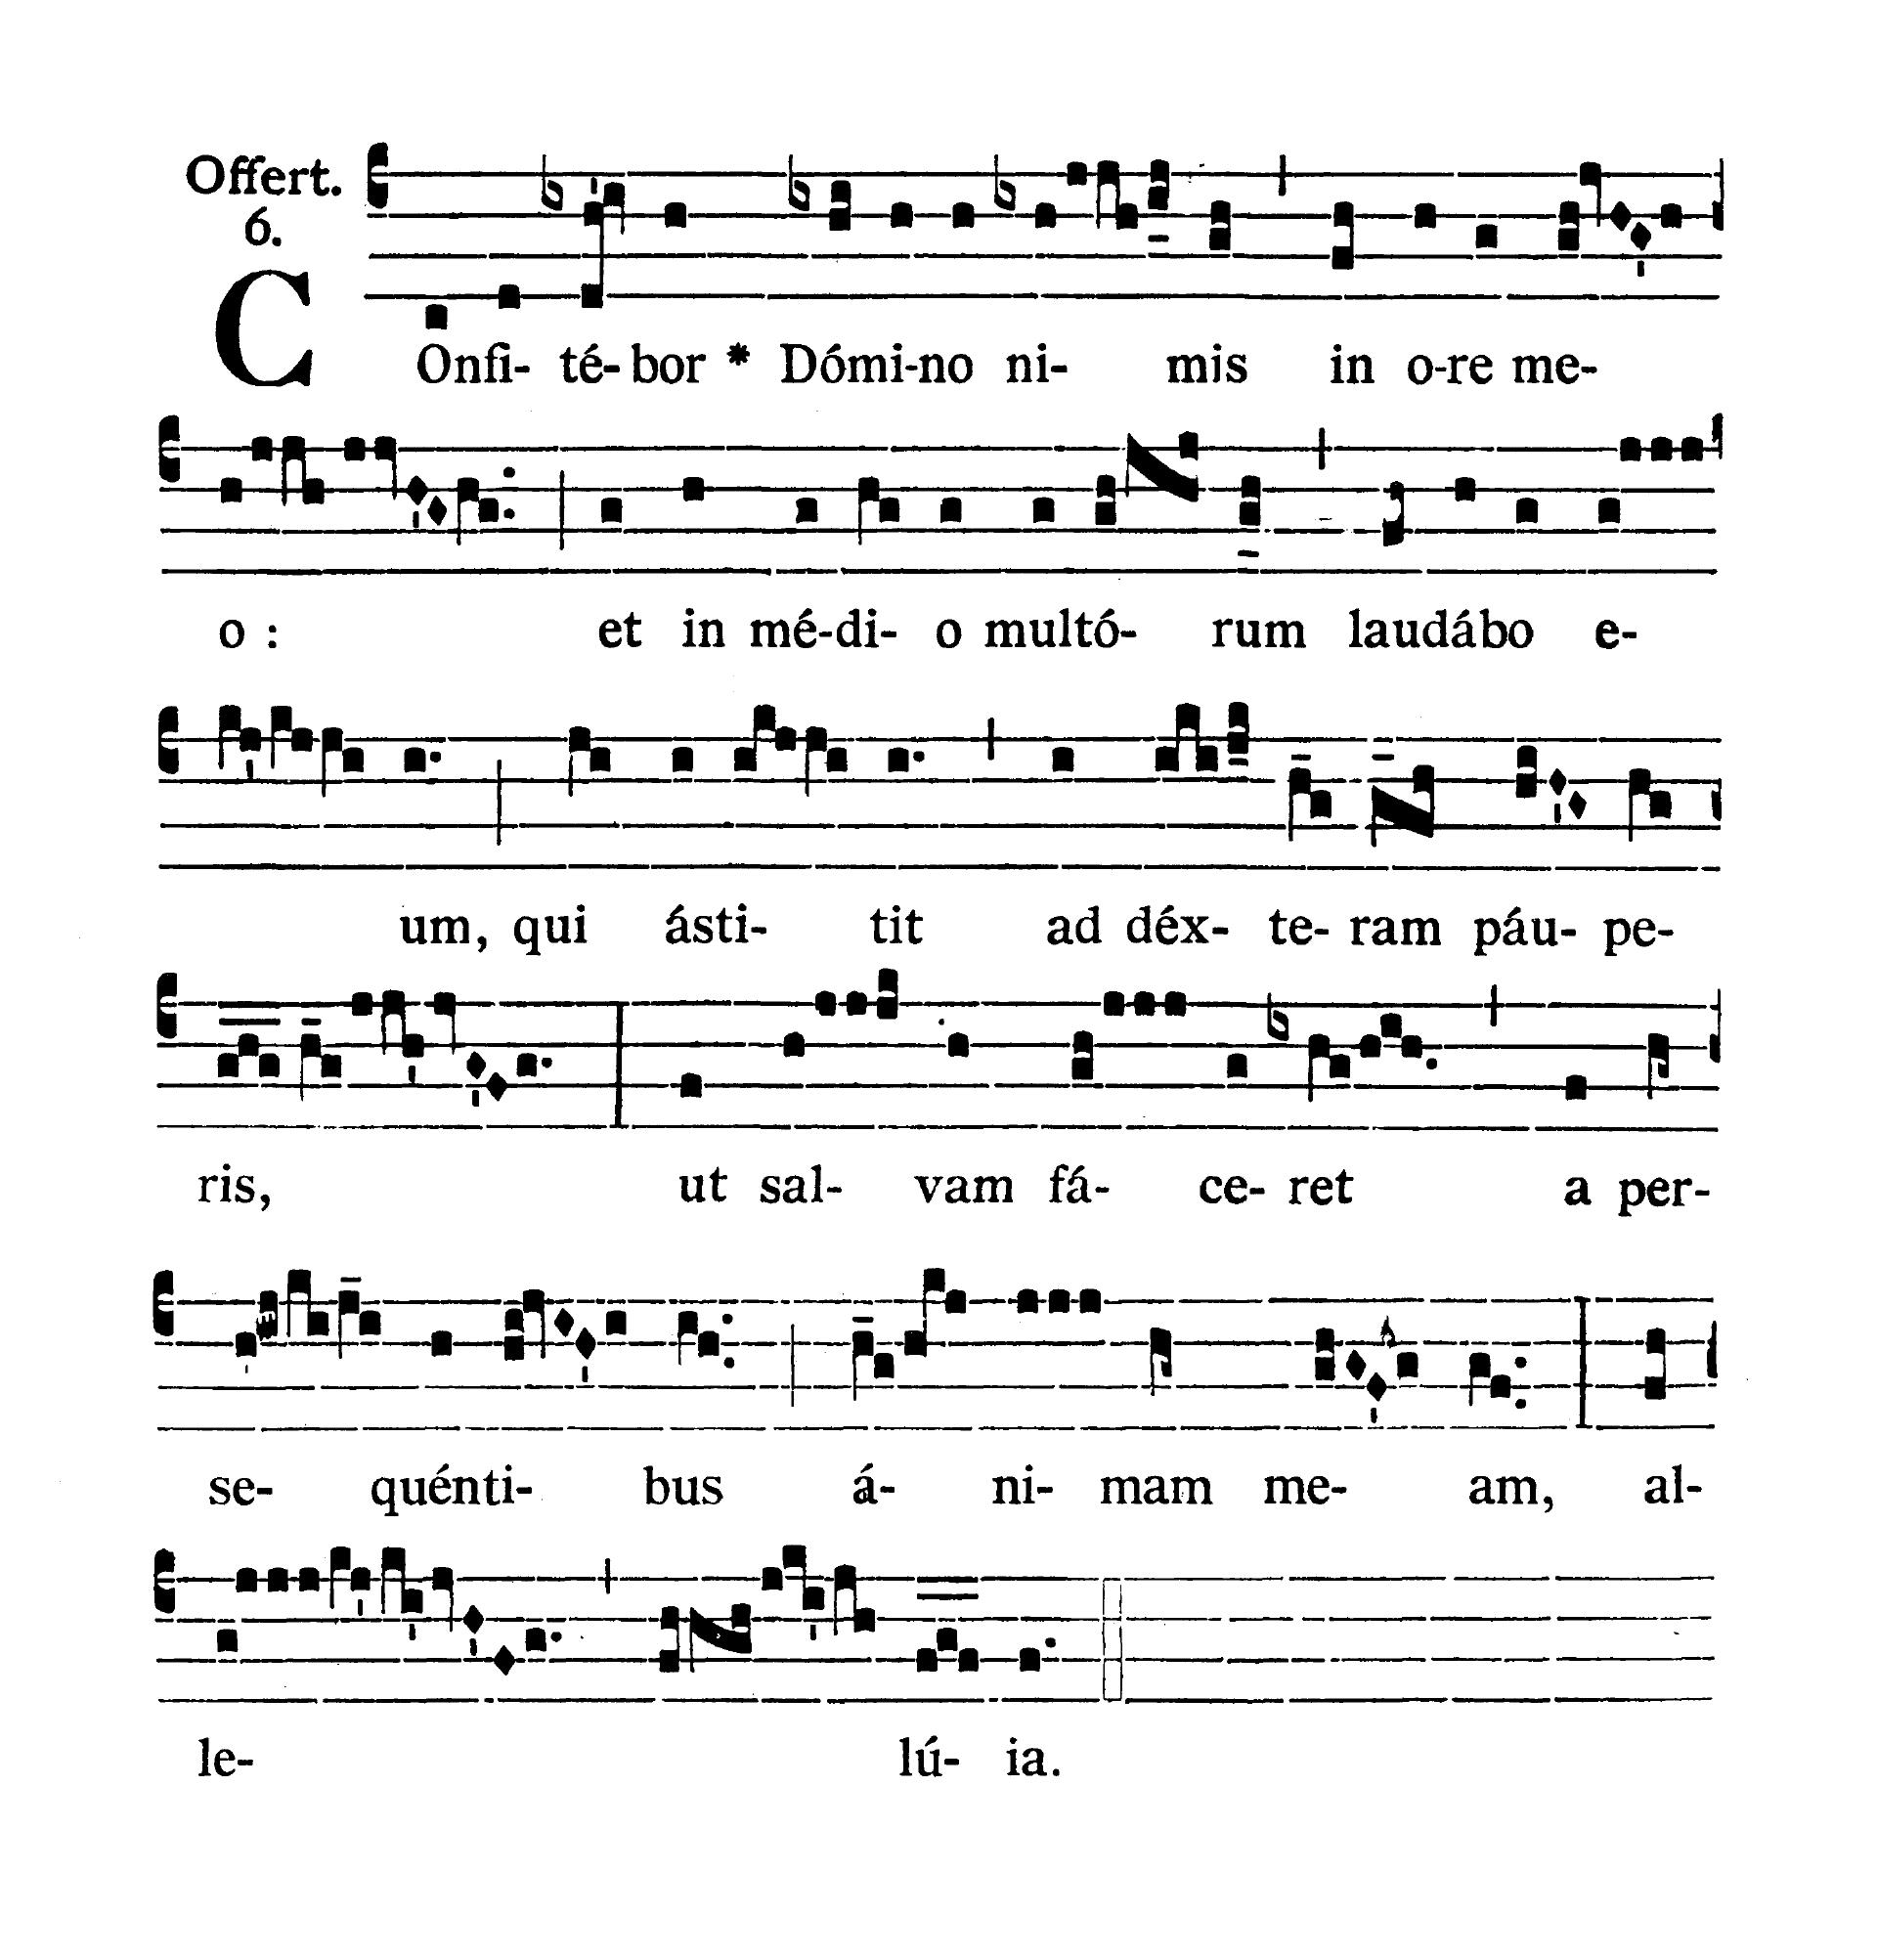 In Litaniis Majoribus et in Minoribus Tempore Paschale (Litanie większe i mniejsze w okresie Wielkanocnym) - Offertorium (Confitebor Domino)